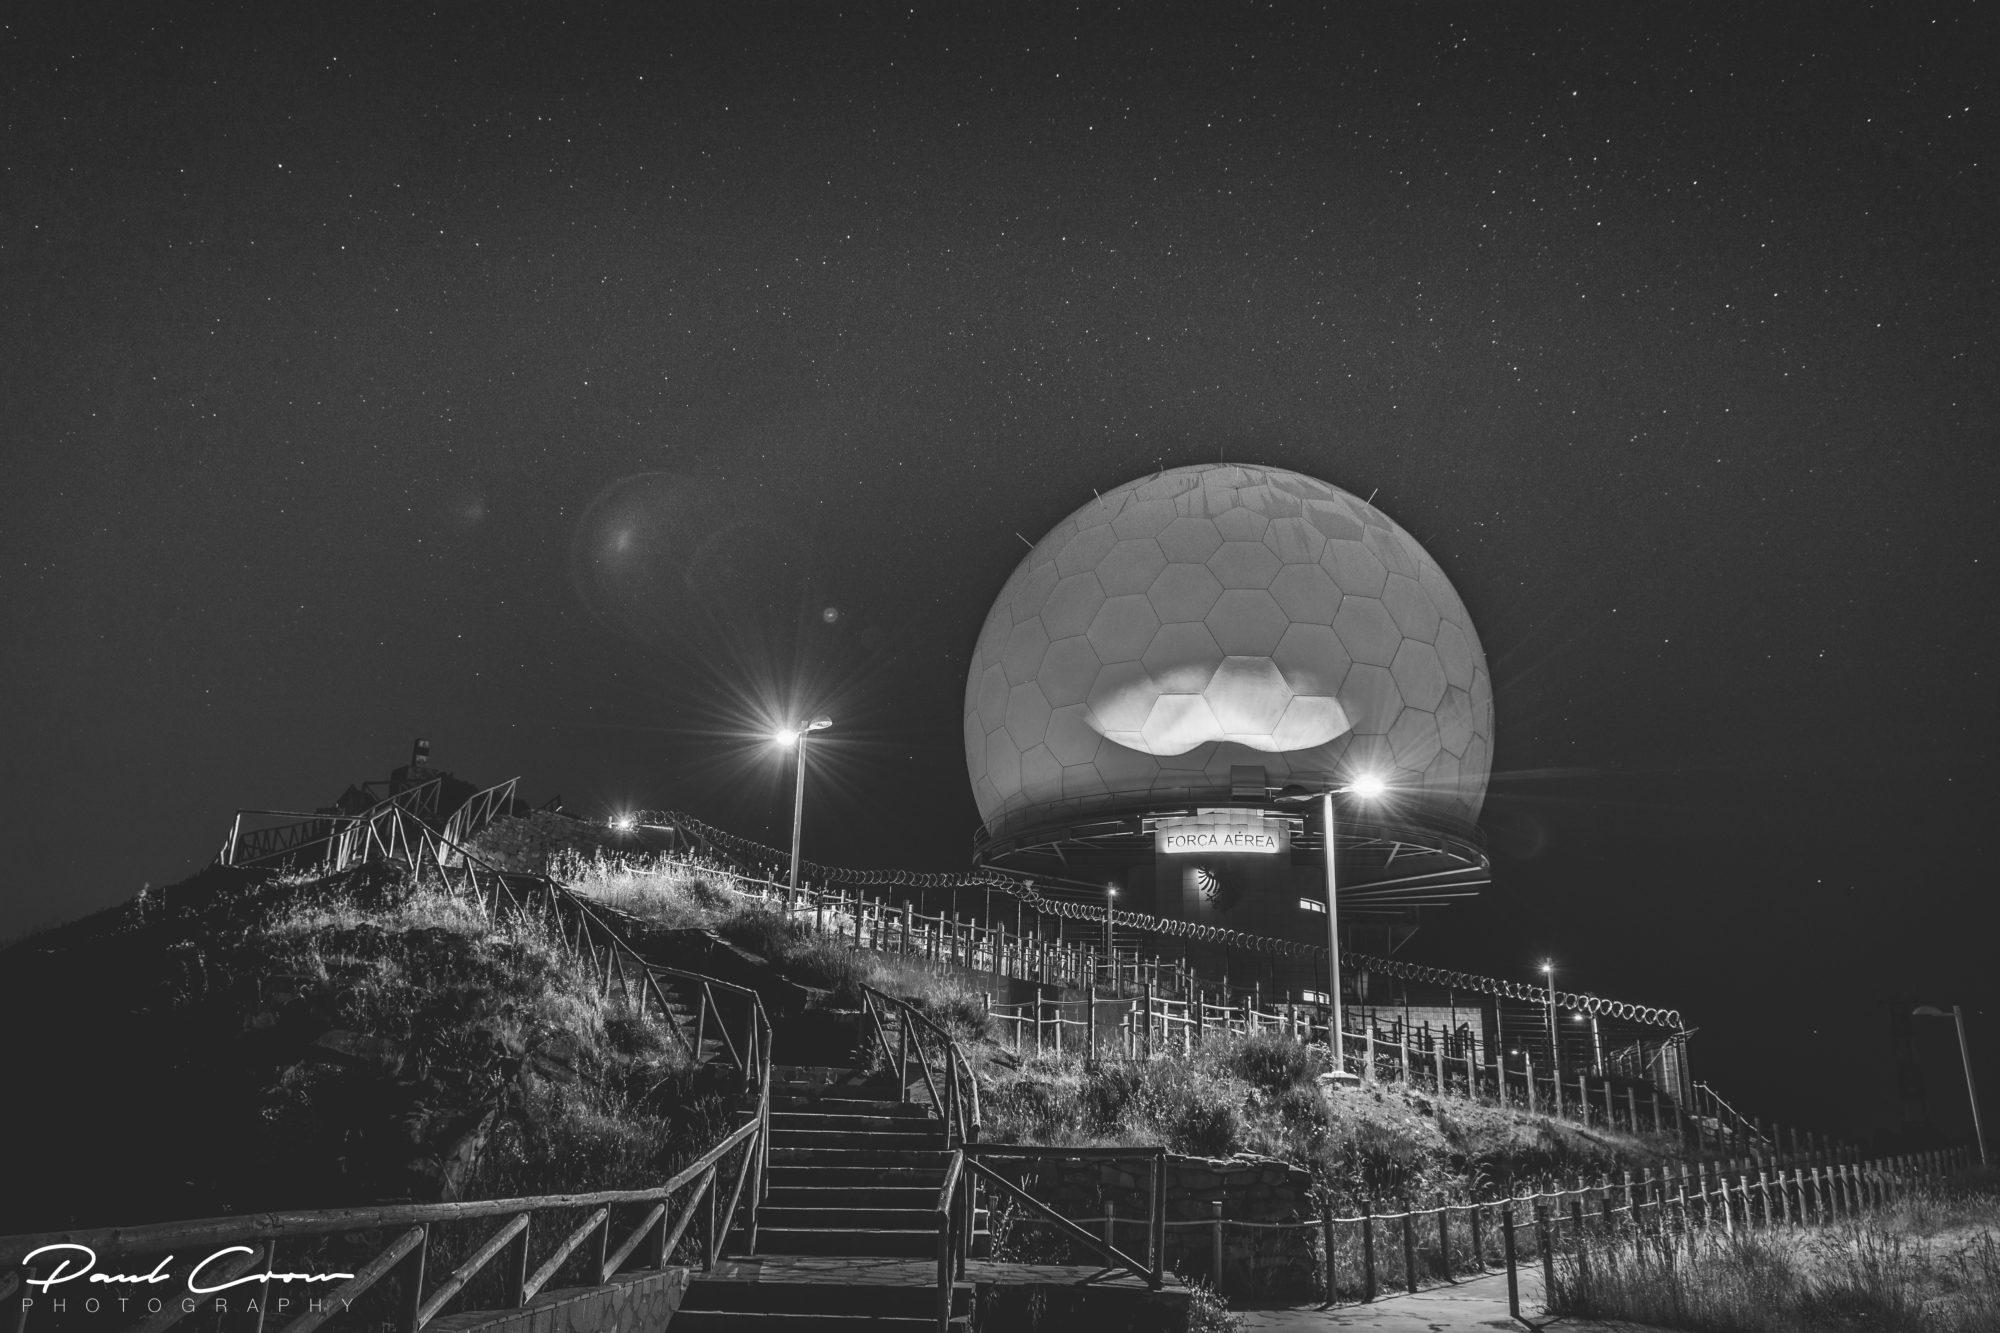 Astro views from Pico Ruivo